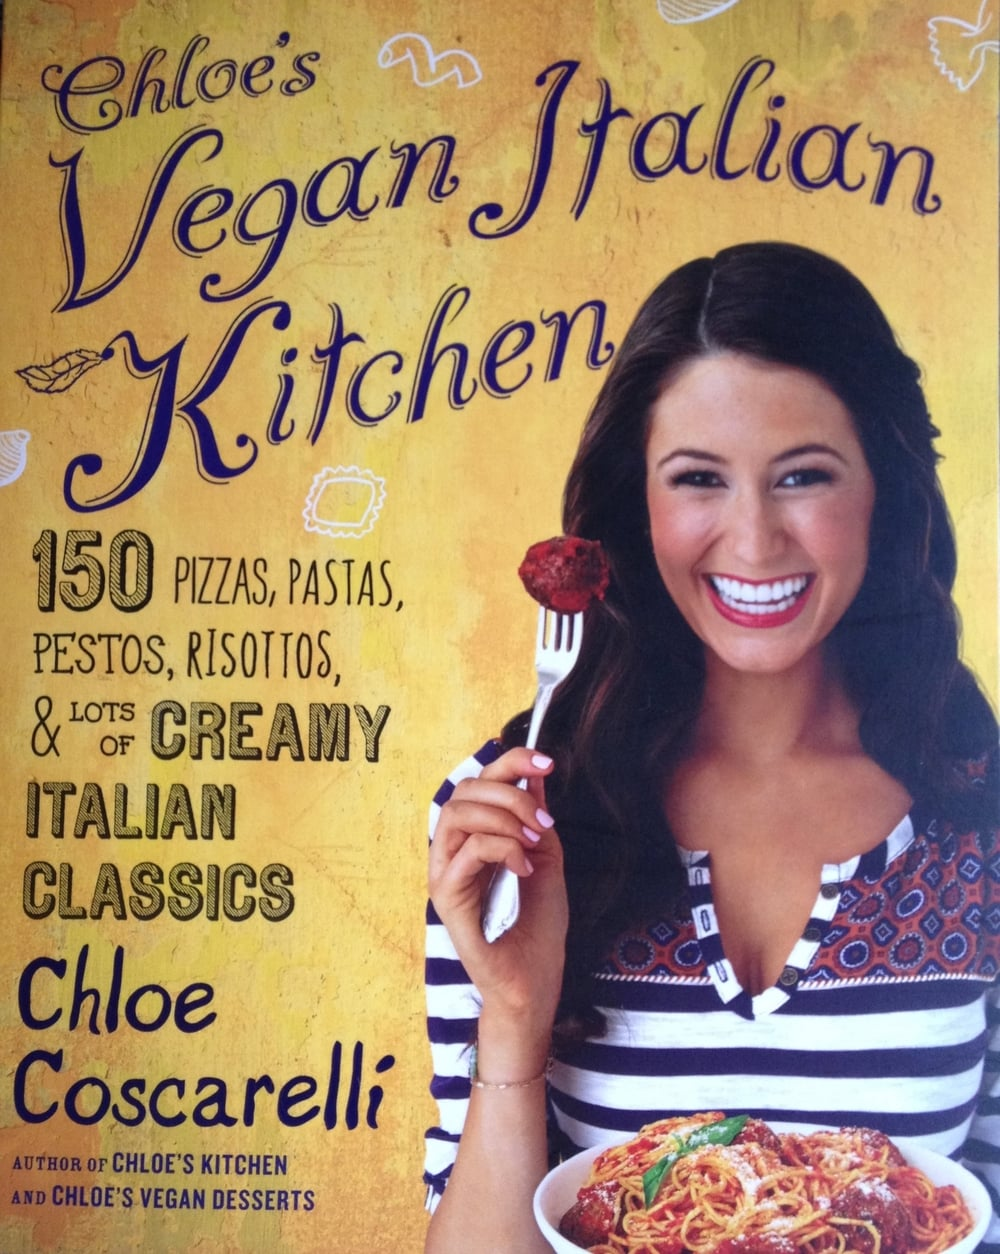 Choloe's Vegan Italian Kitchen. My Favorite Vegan Cookbooks!  www.tammyblomsterberg.com